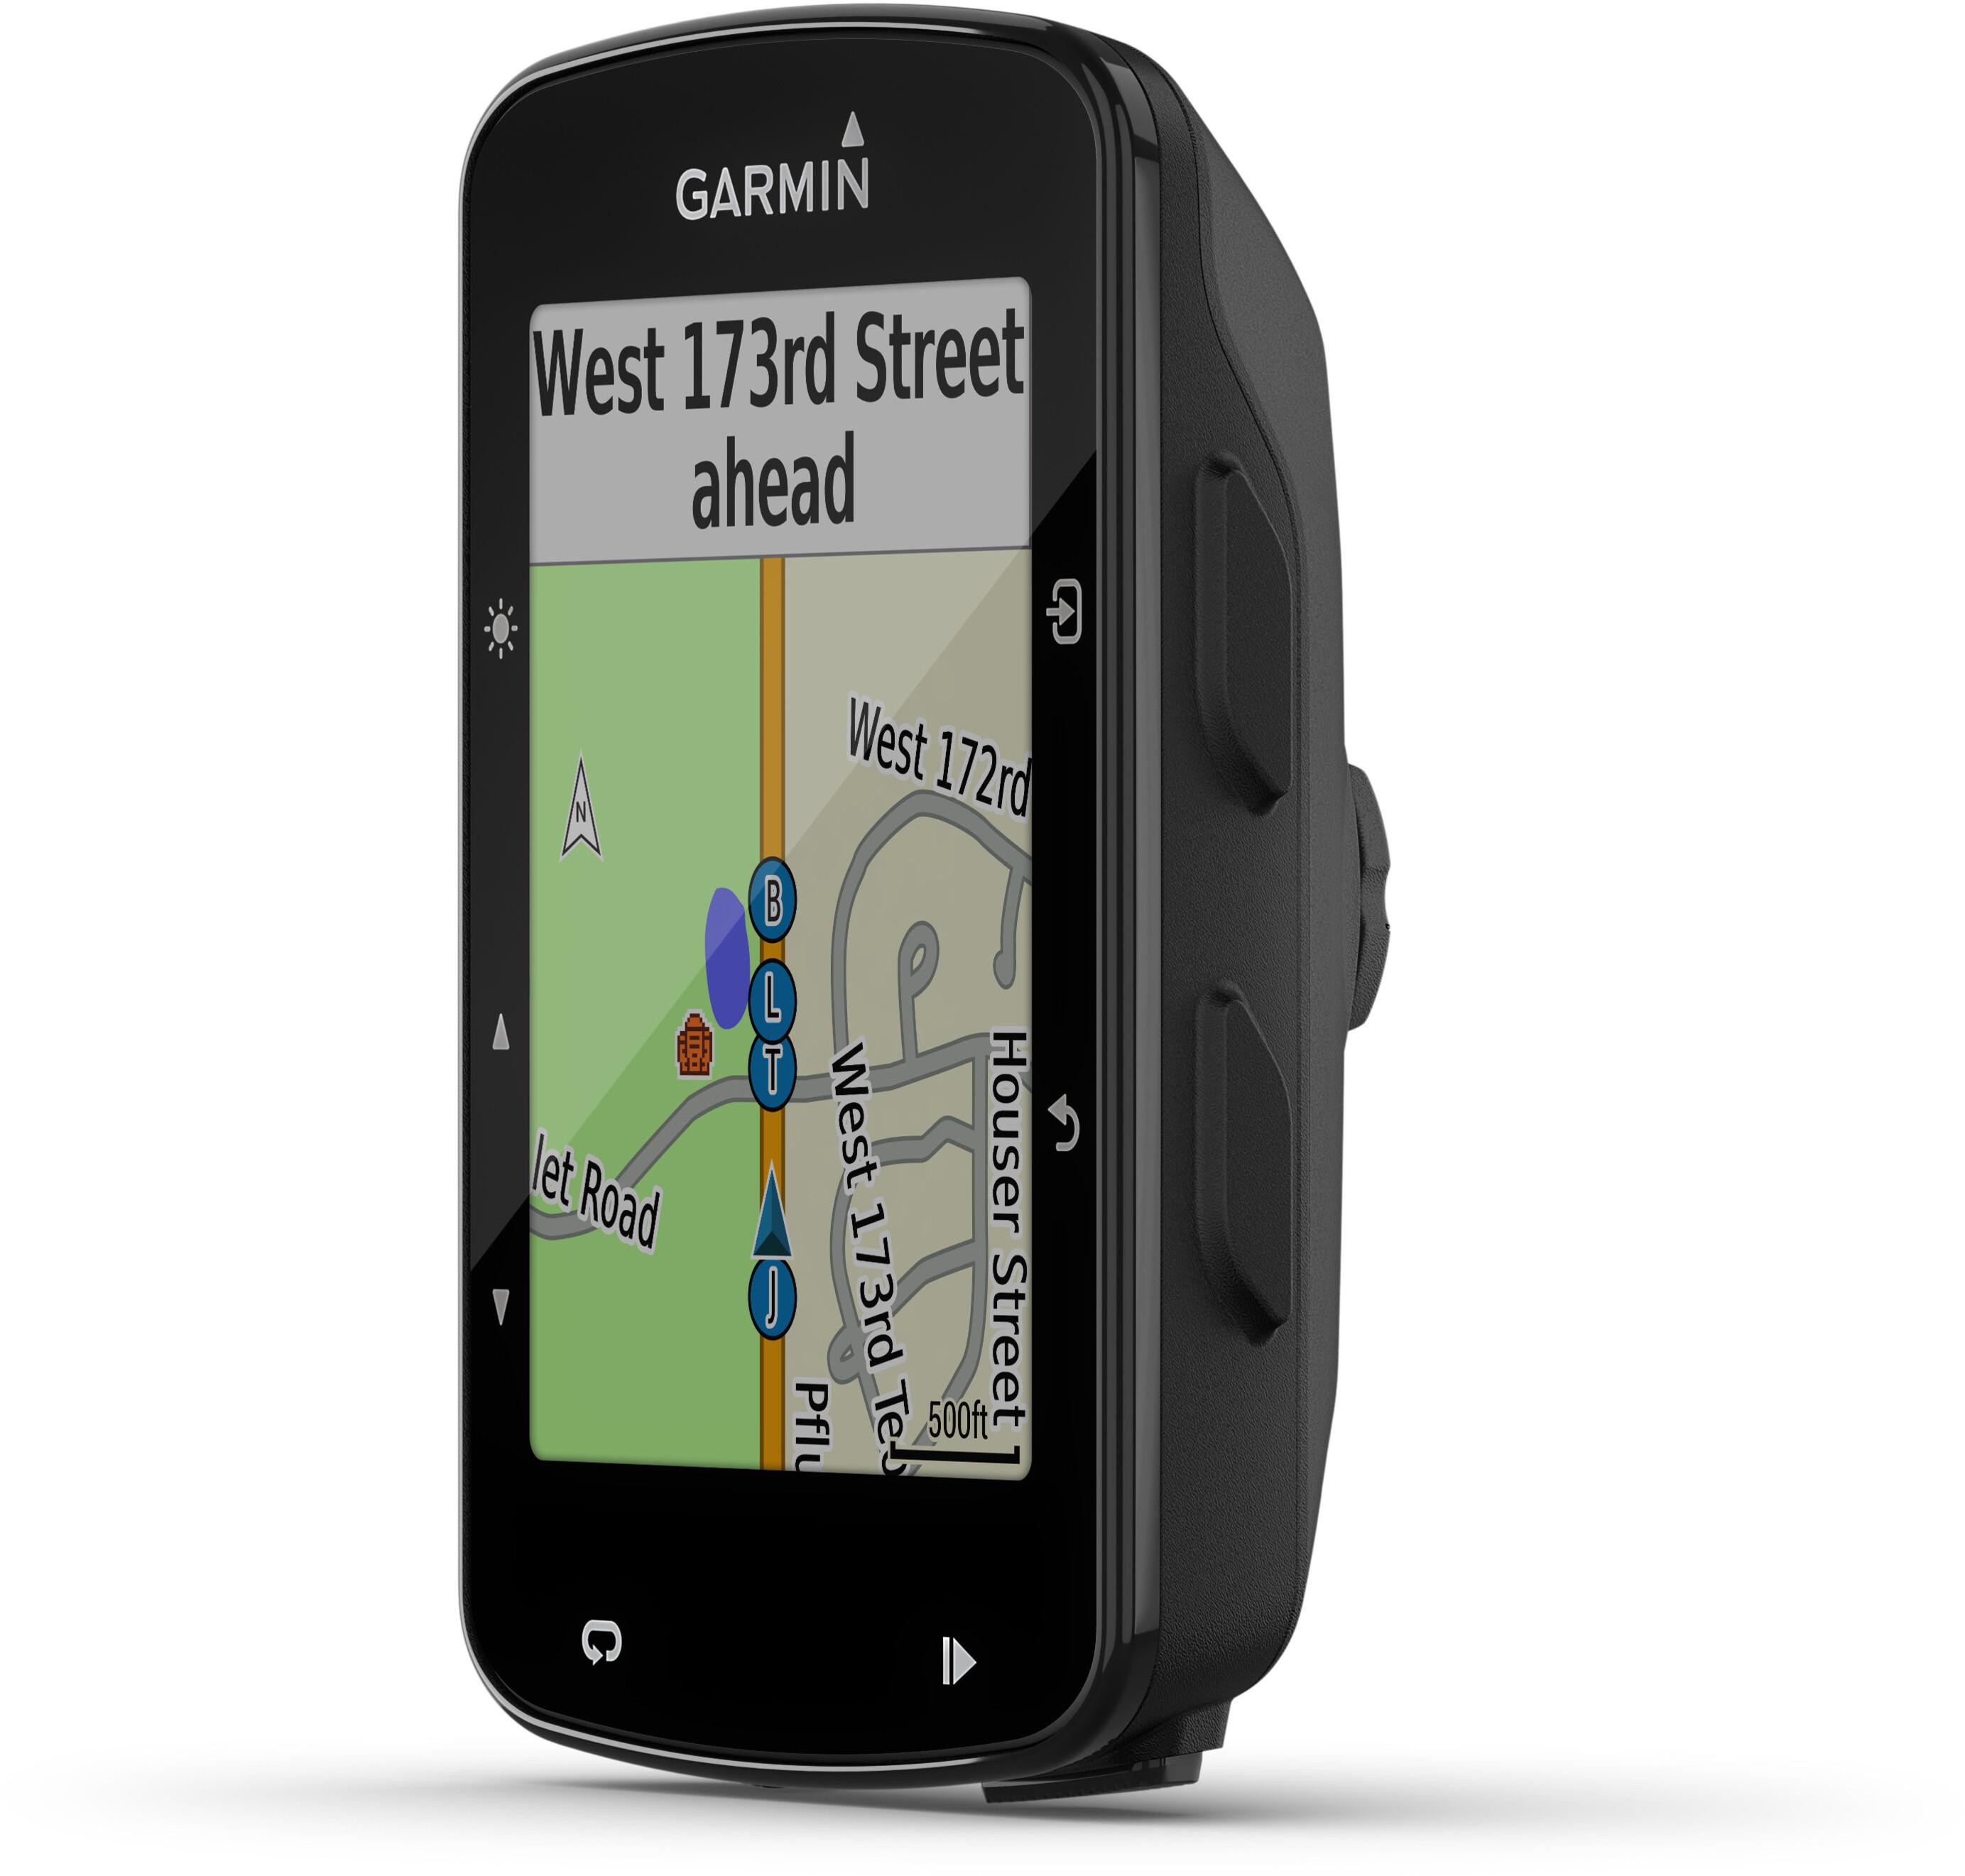 garmin edge 520 navigation review